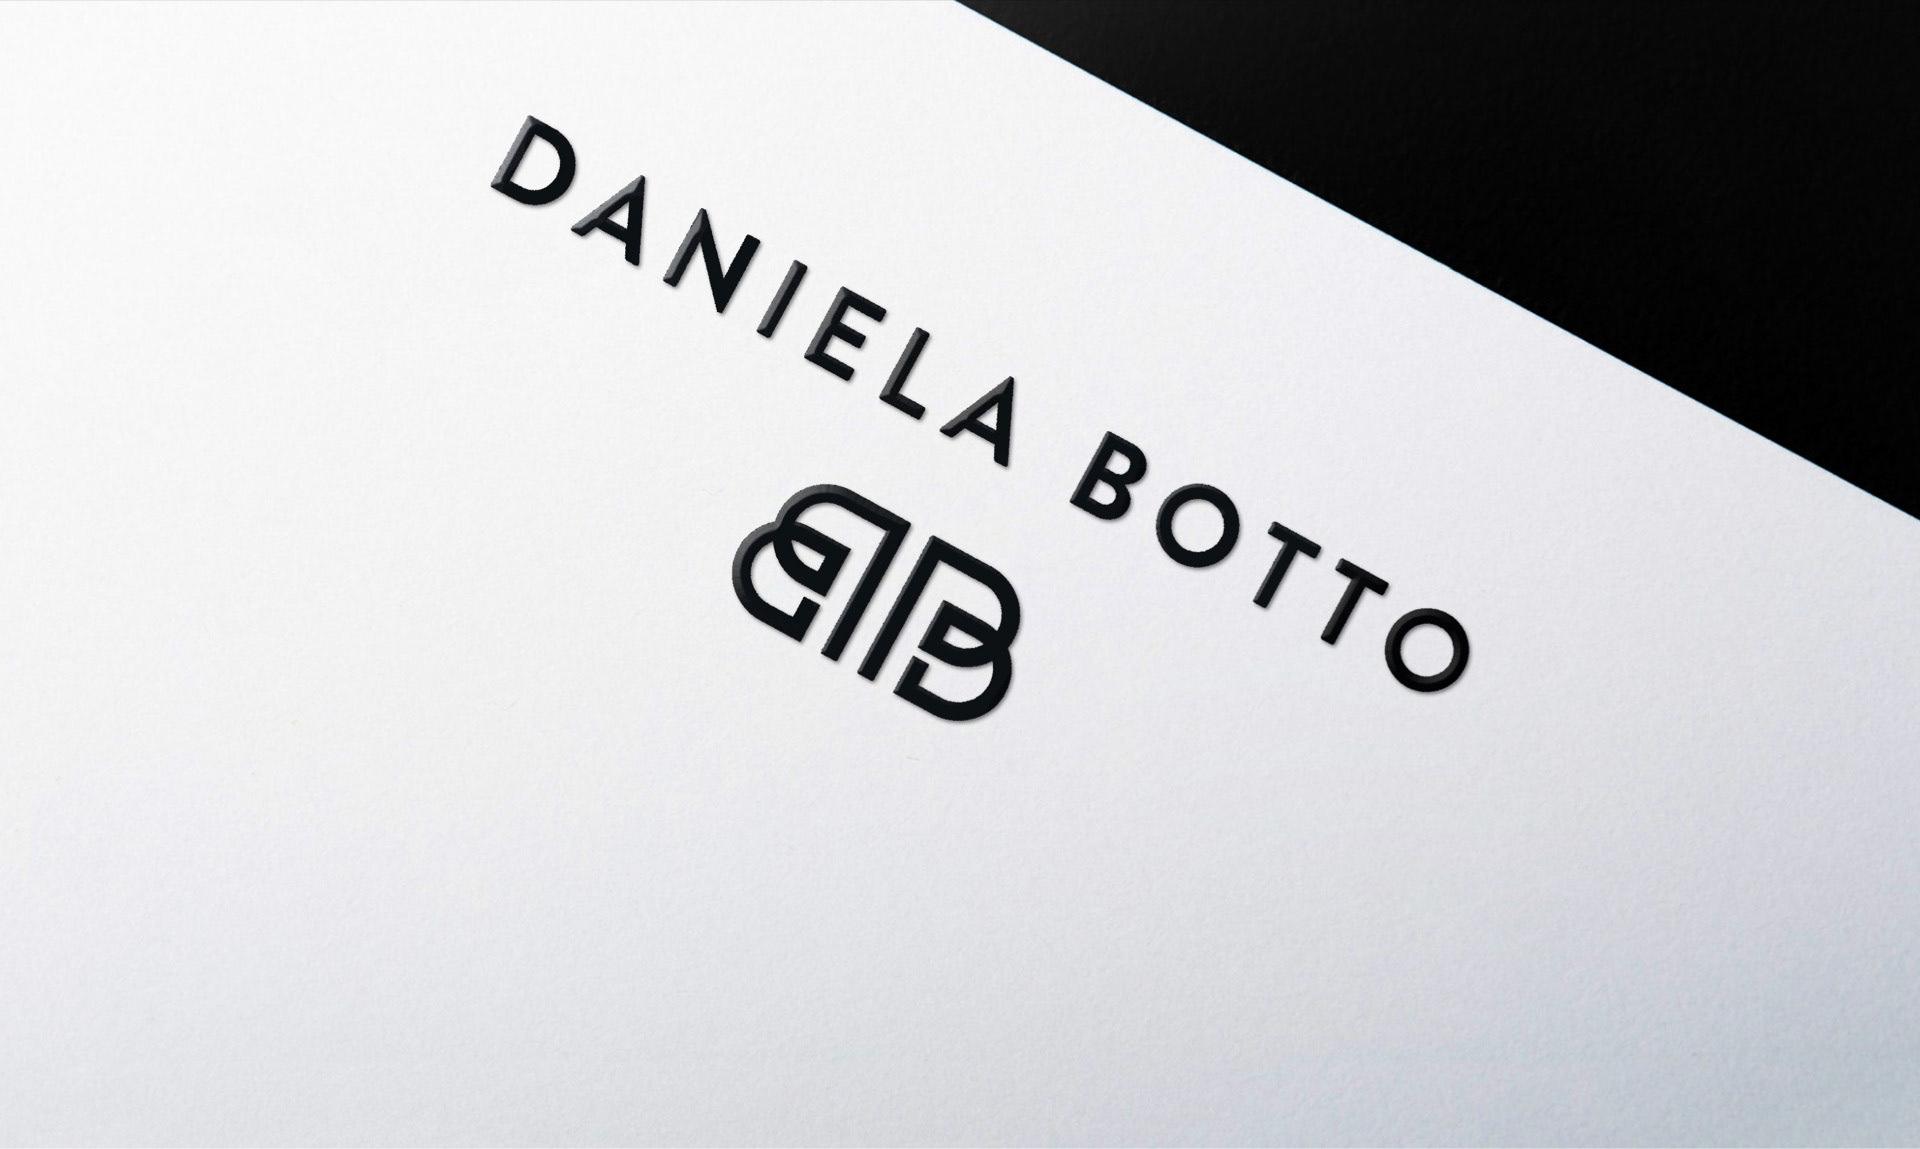 Daniela-Botto-logotipo